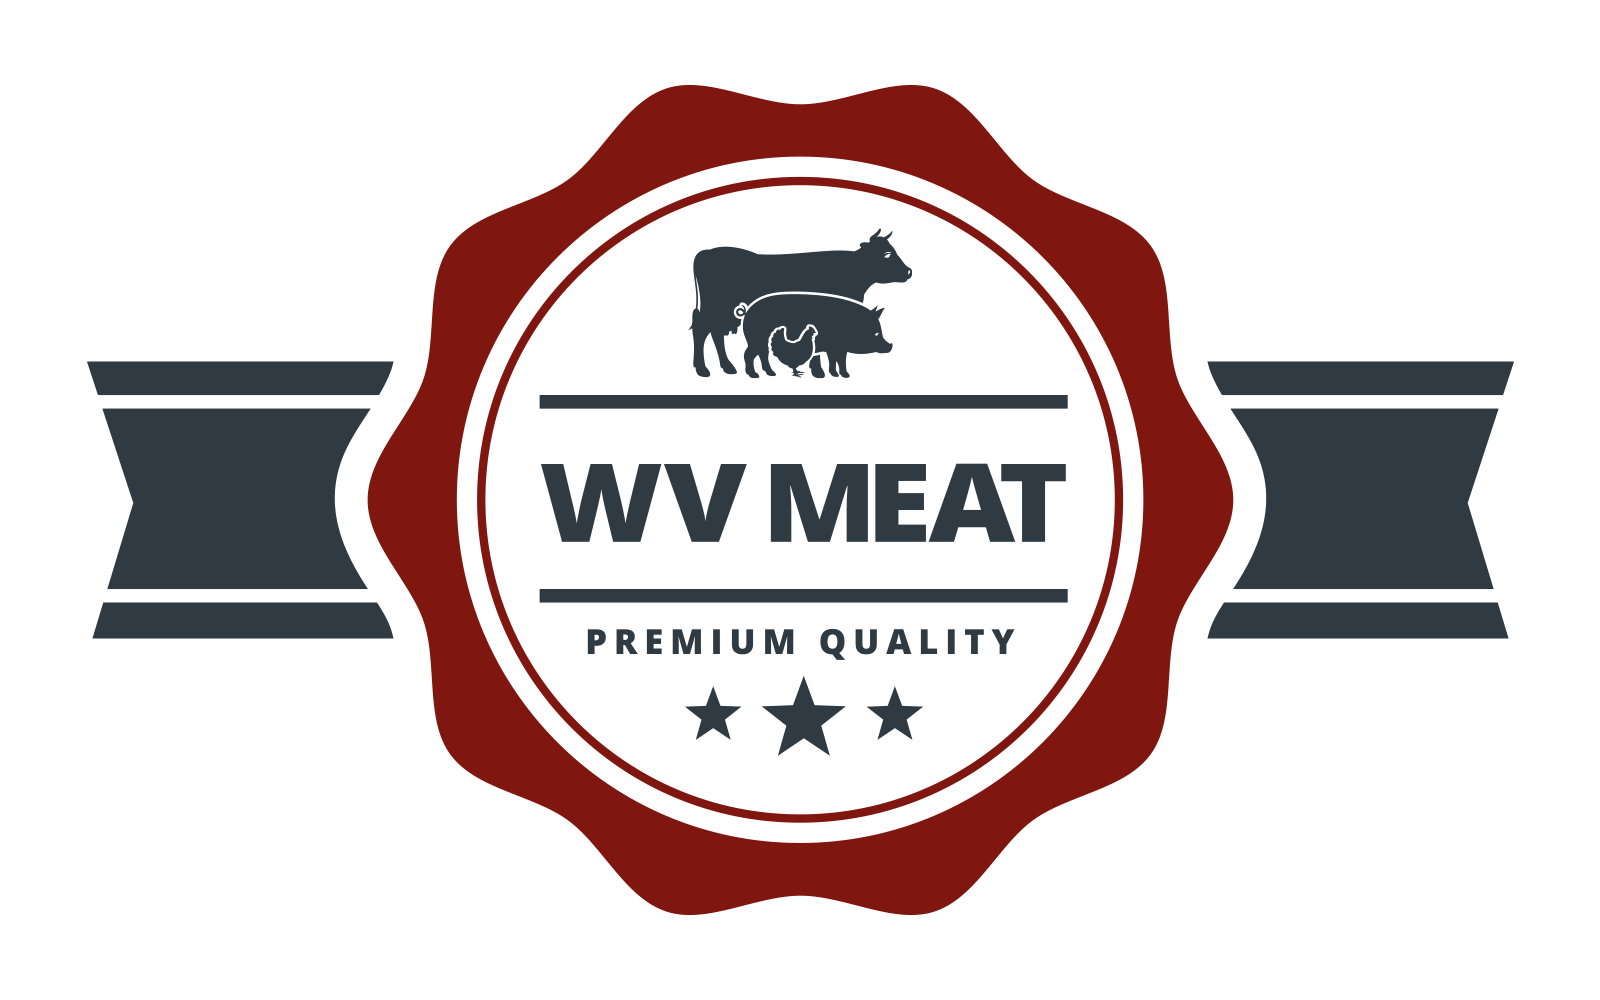 pf-logo-wv-meat